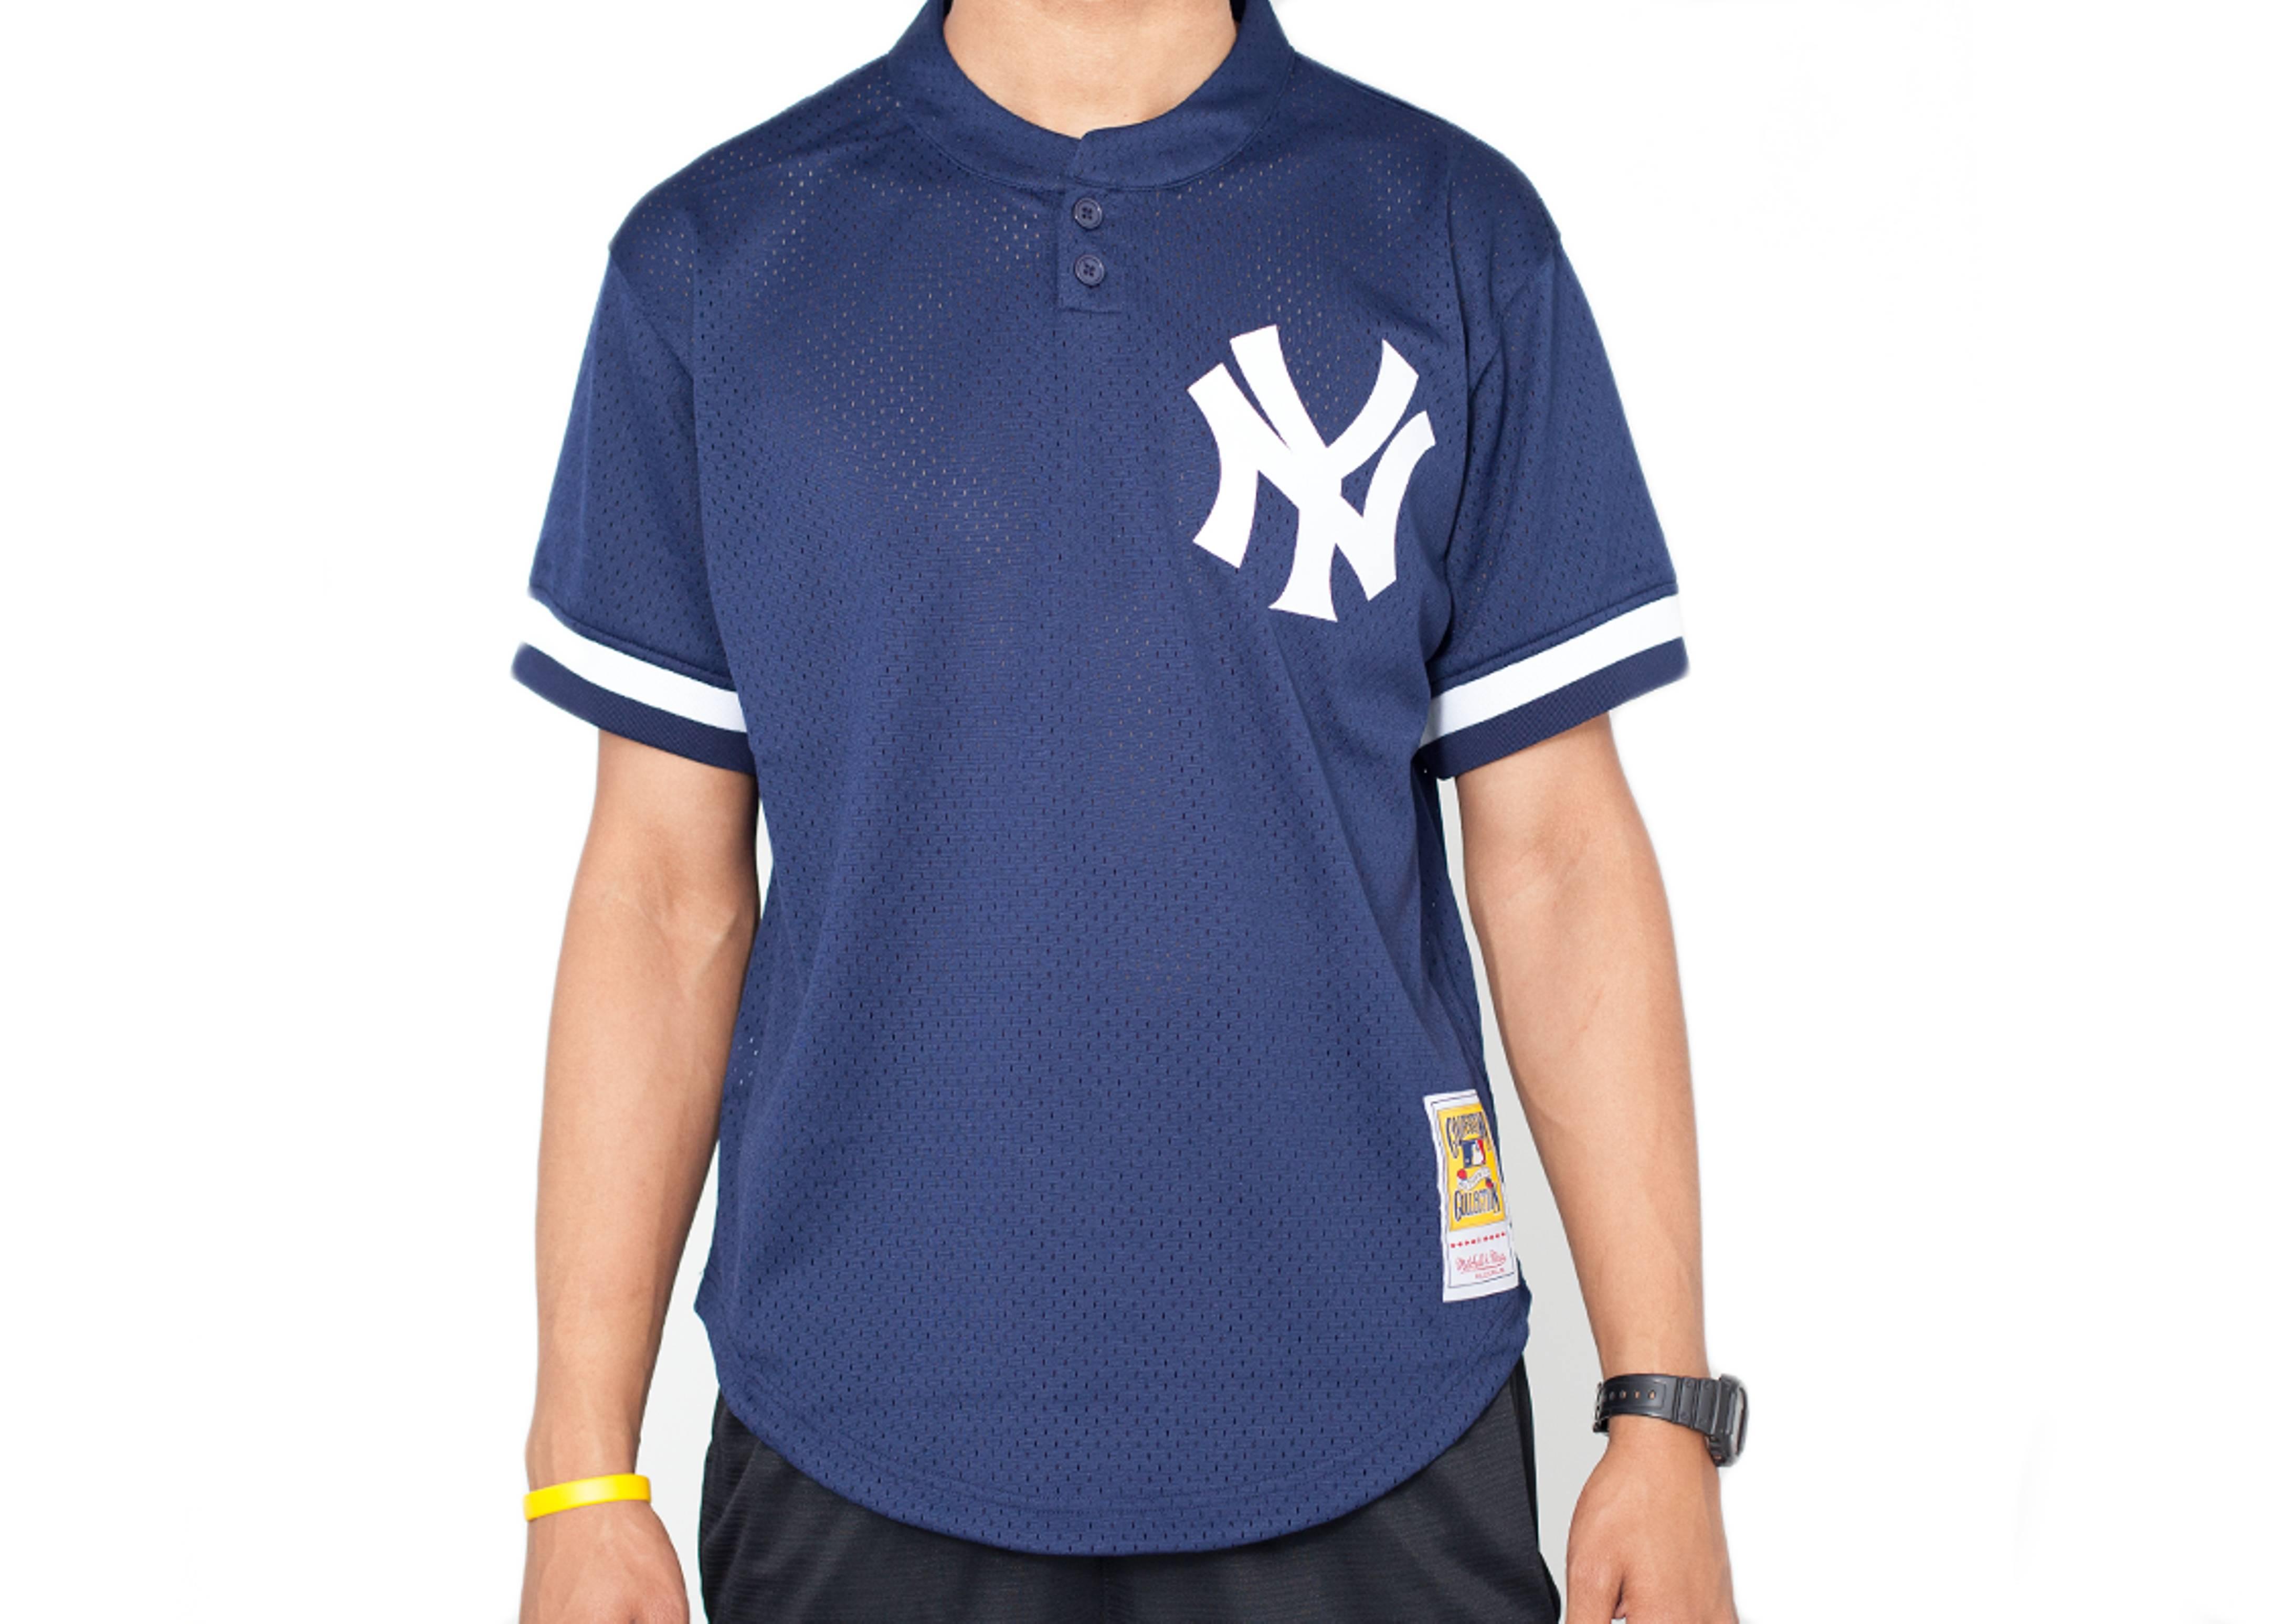 premium selection bdbe8 aac10 New York Yankees Authentic Mesh Bp Jersey